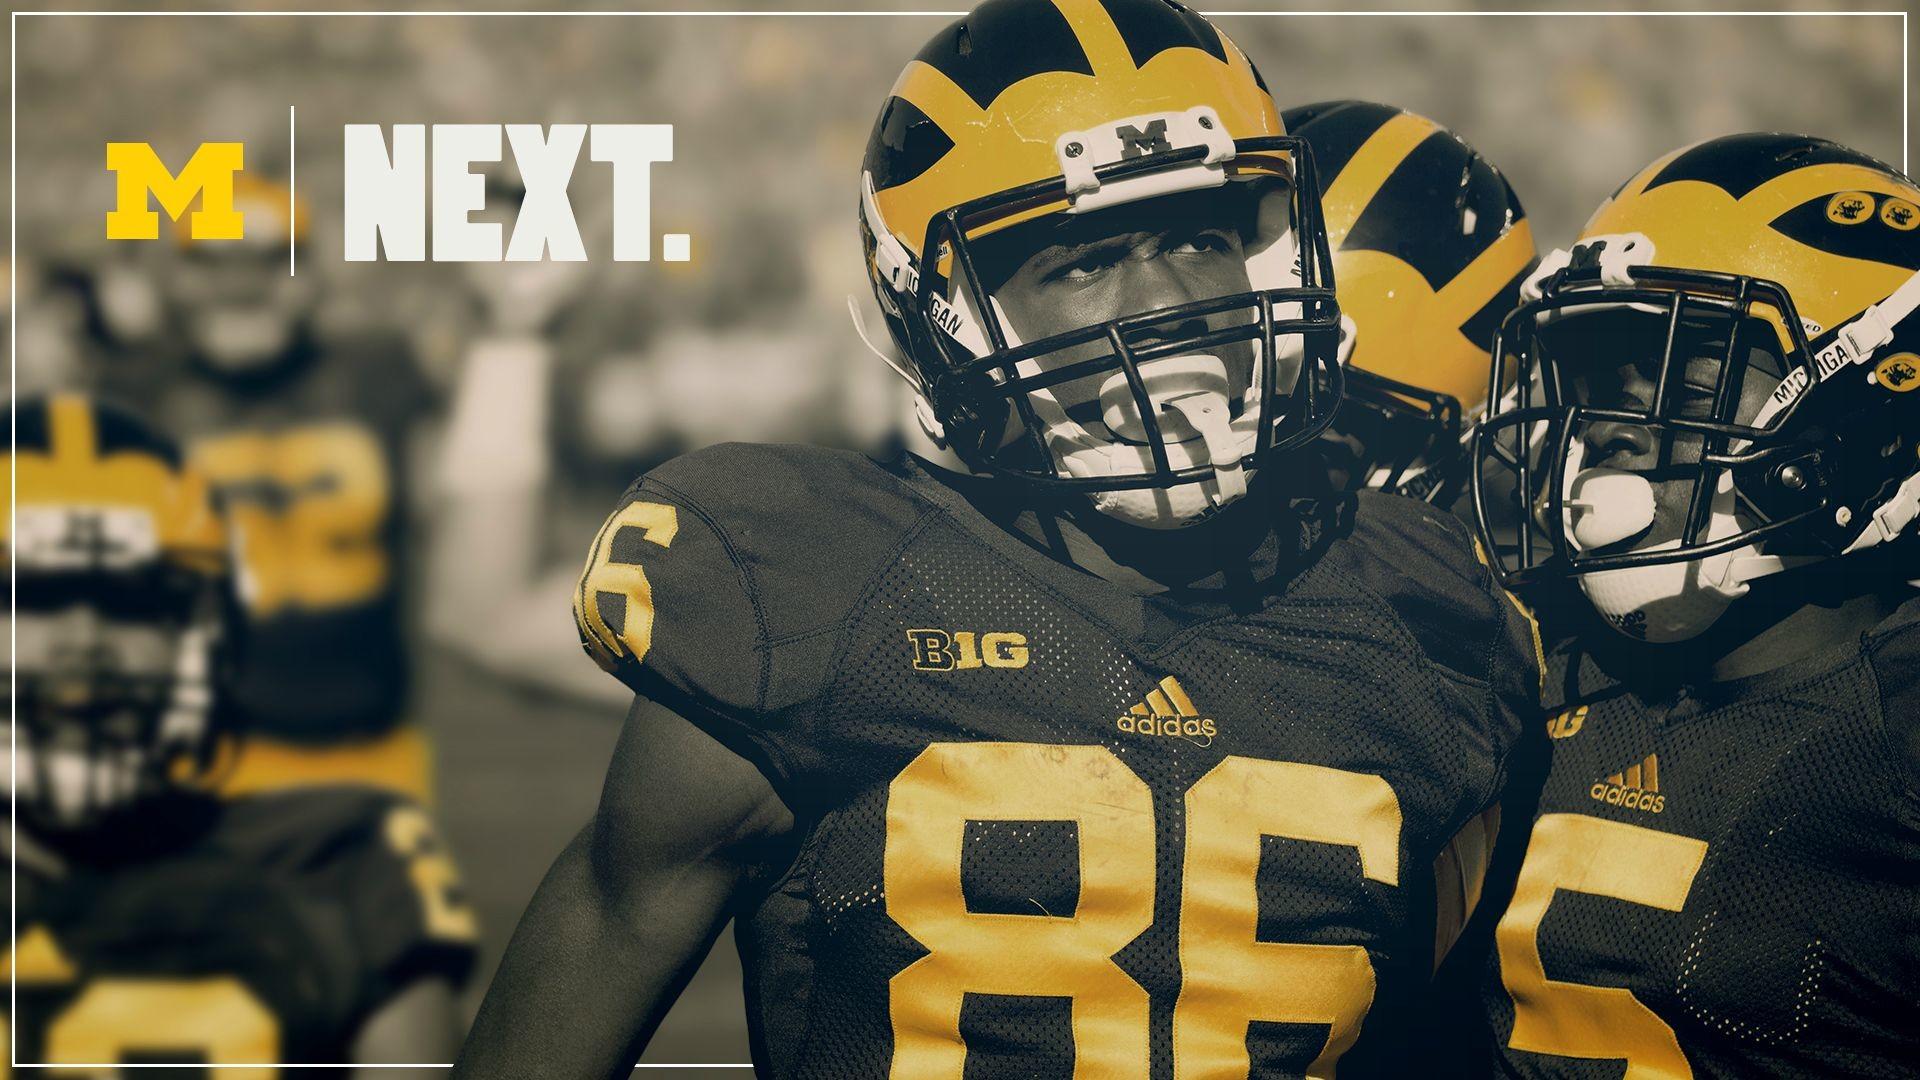 Michigan Wolverines Screensaver and Wallpaper